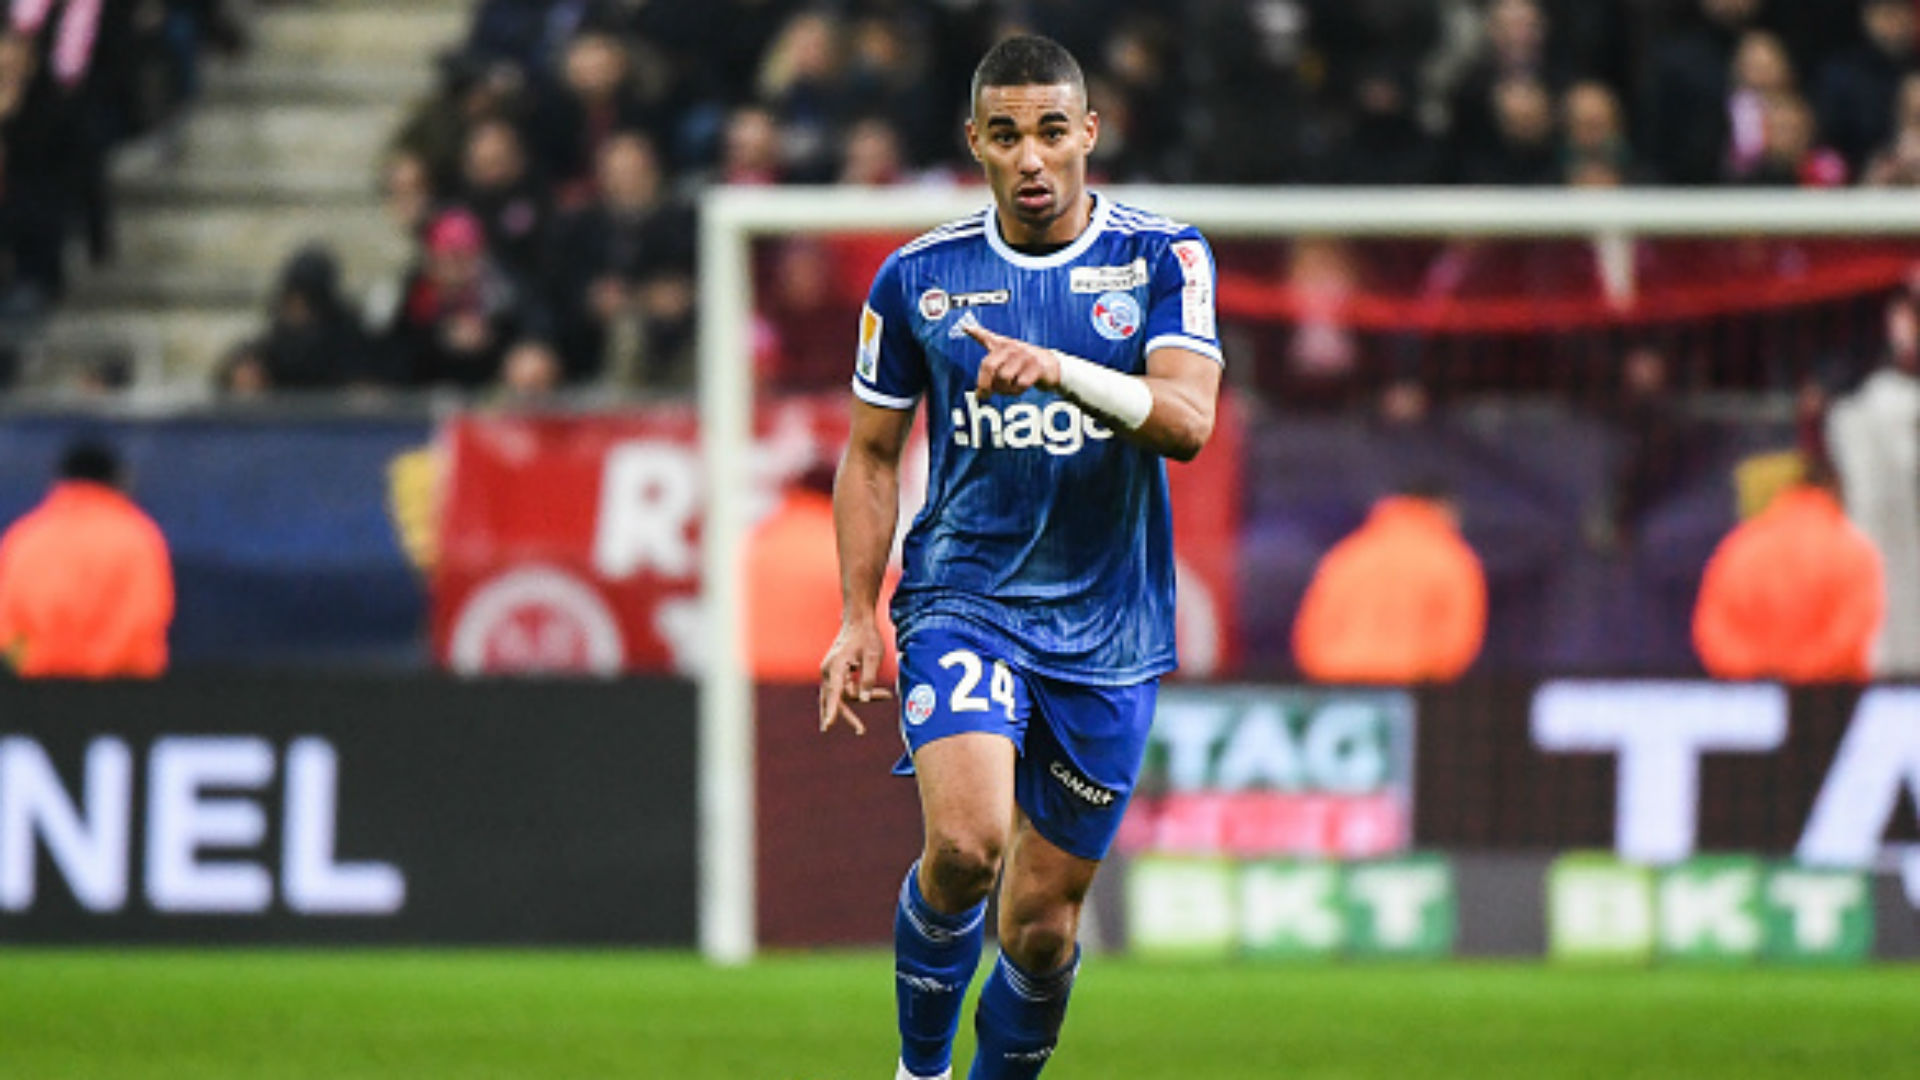 Alexander Djiku reveals his teammate who collapsed against Lyon is fine